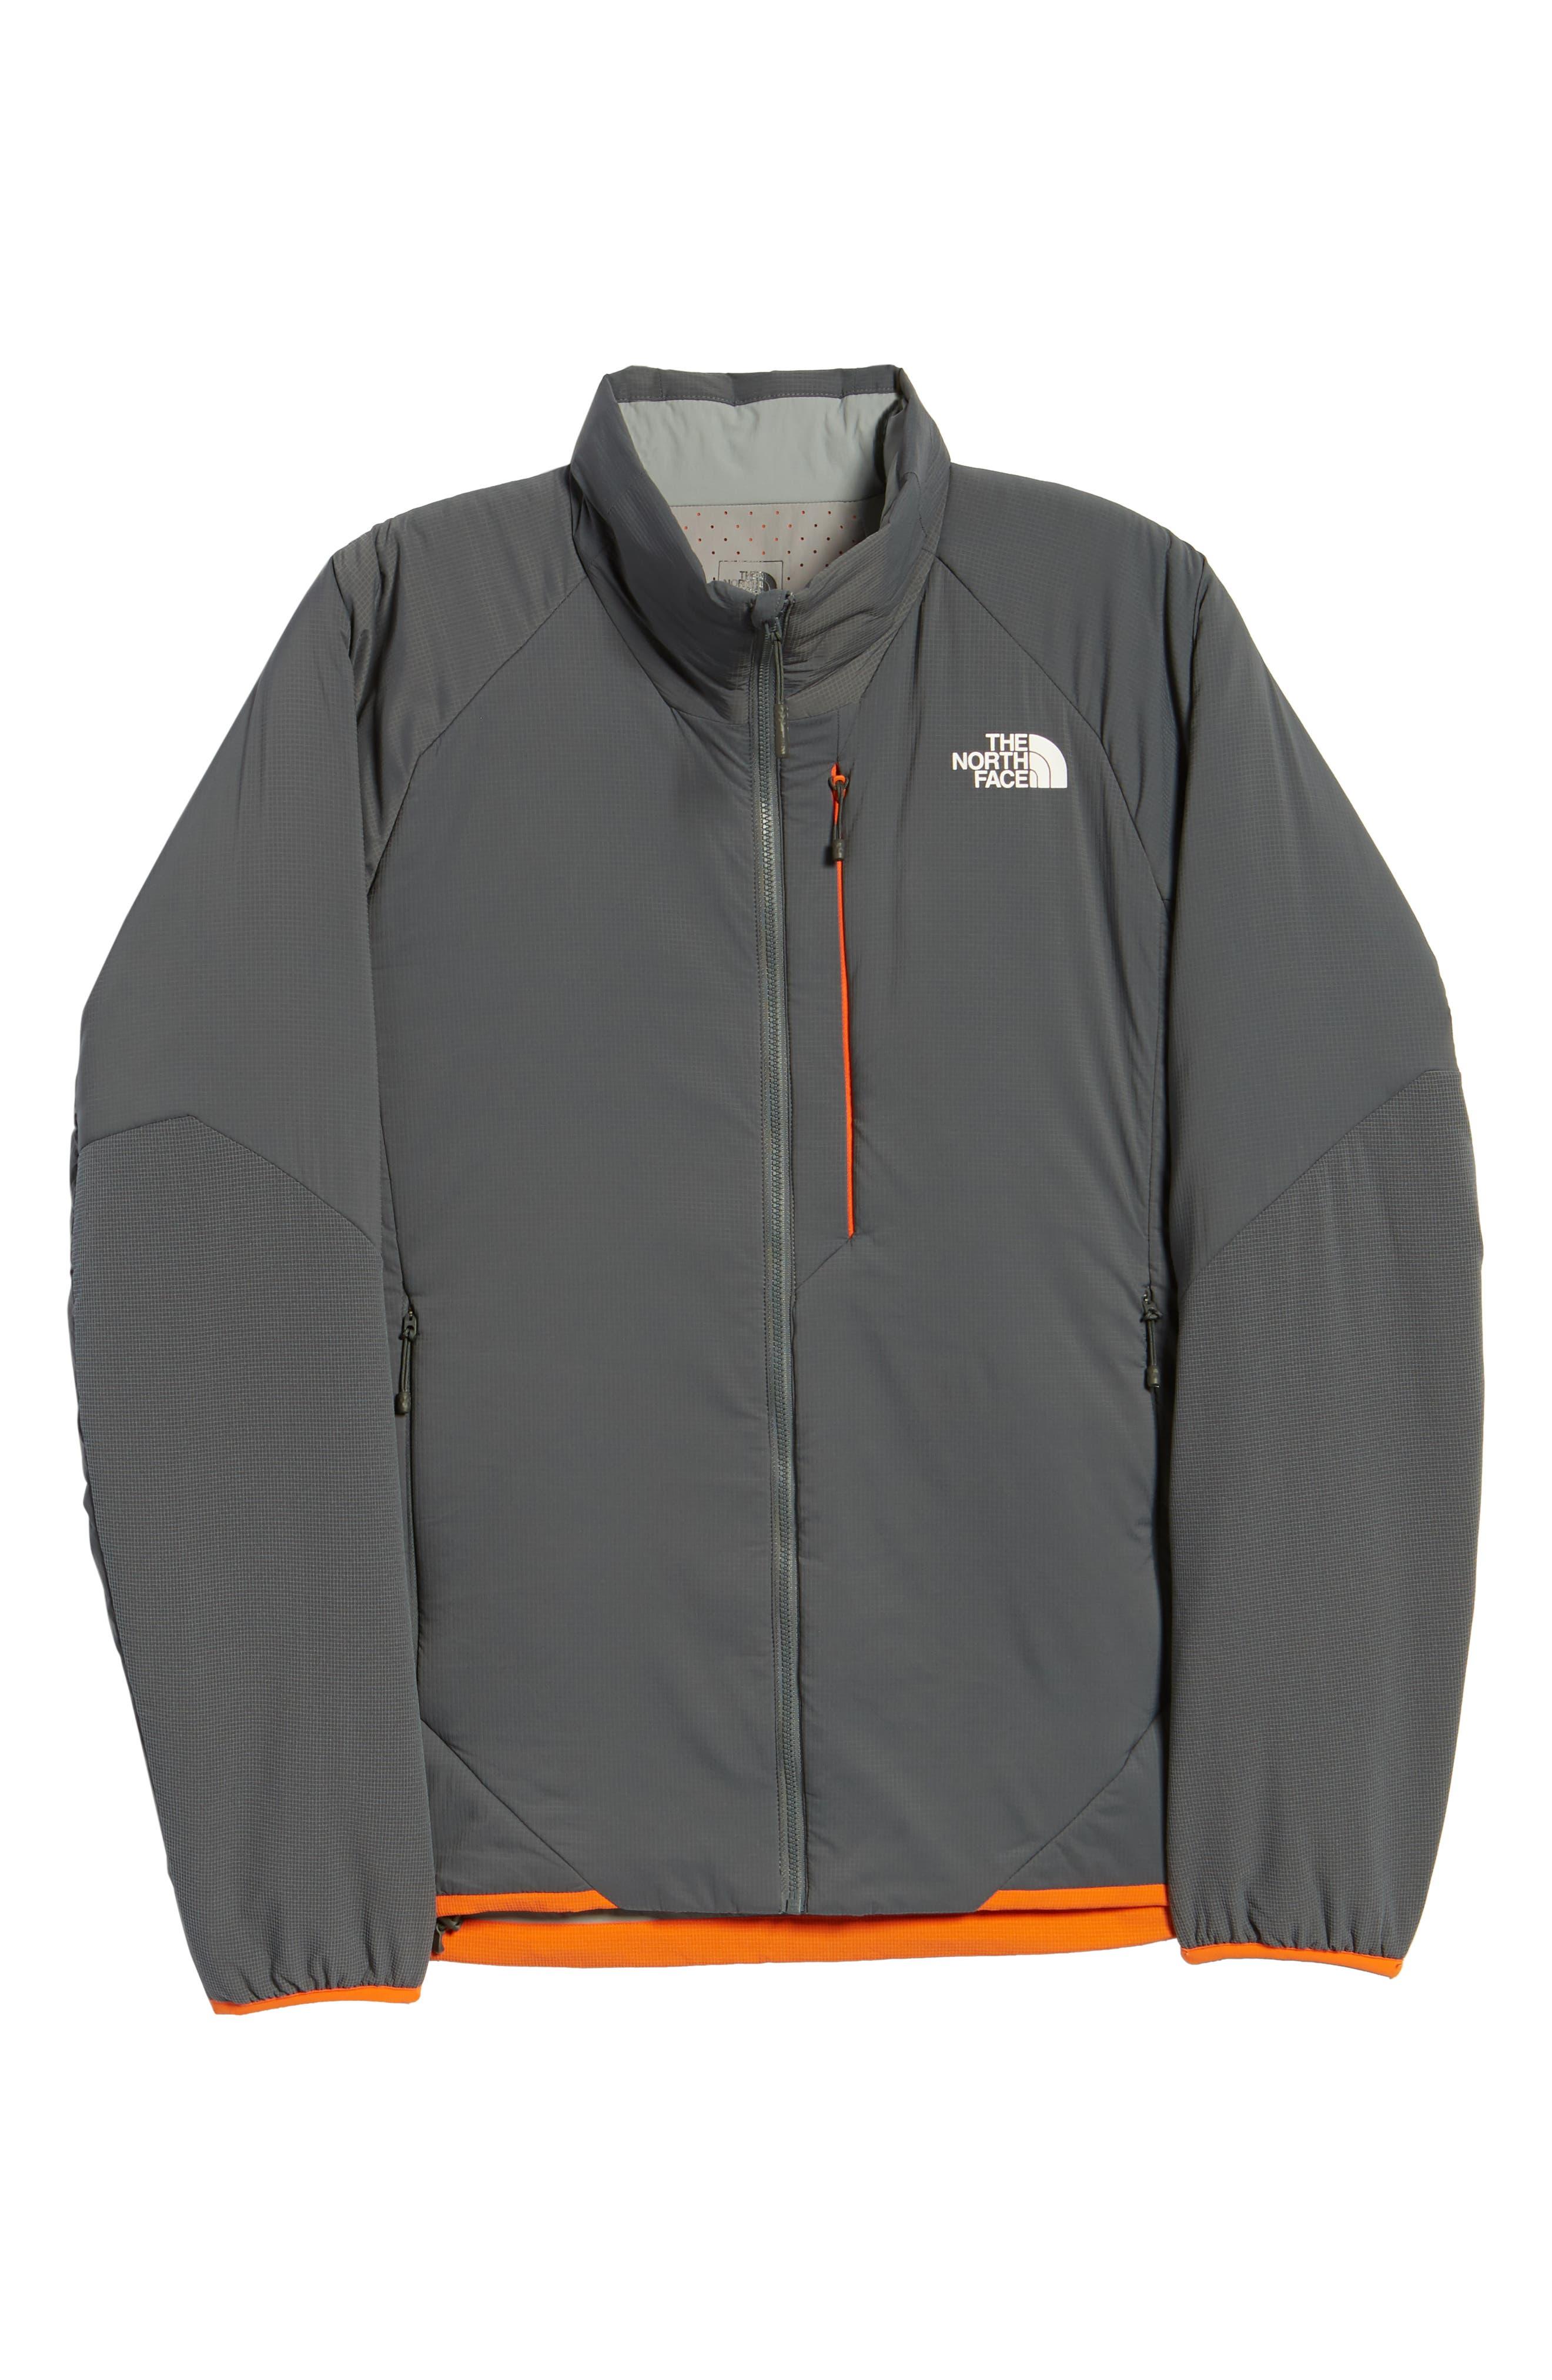 Ventrix Water Resistant Ripstop Jacket,                             Alternate thumbnail 6, color,                             VANADIS GREY/ VANADIS GREY